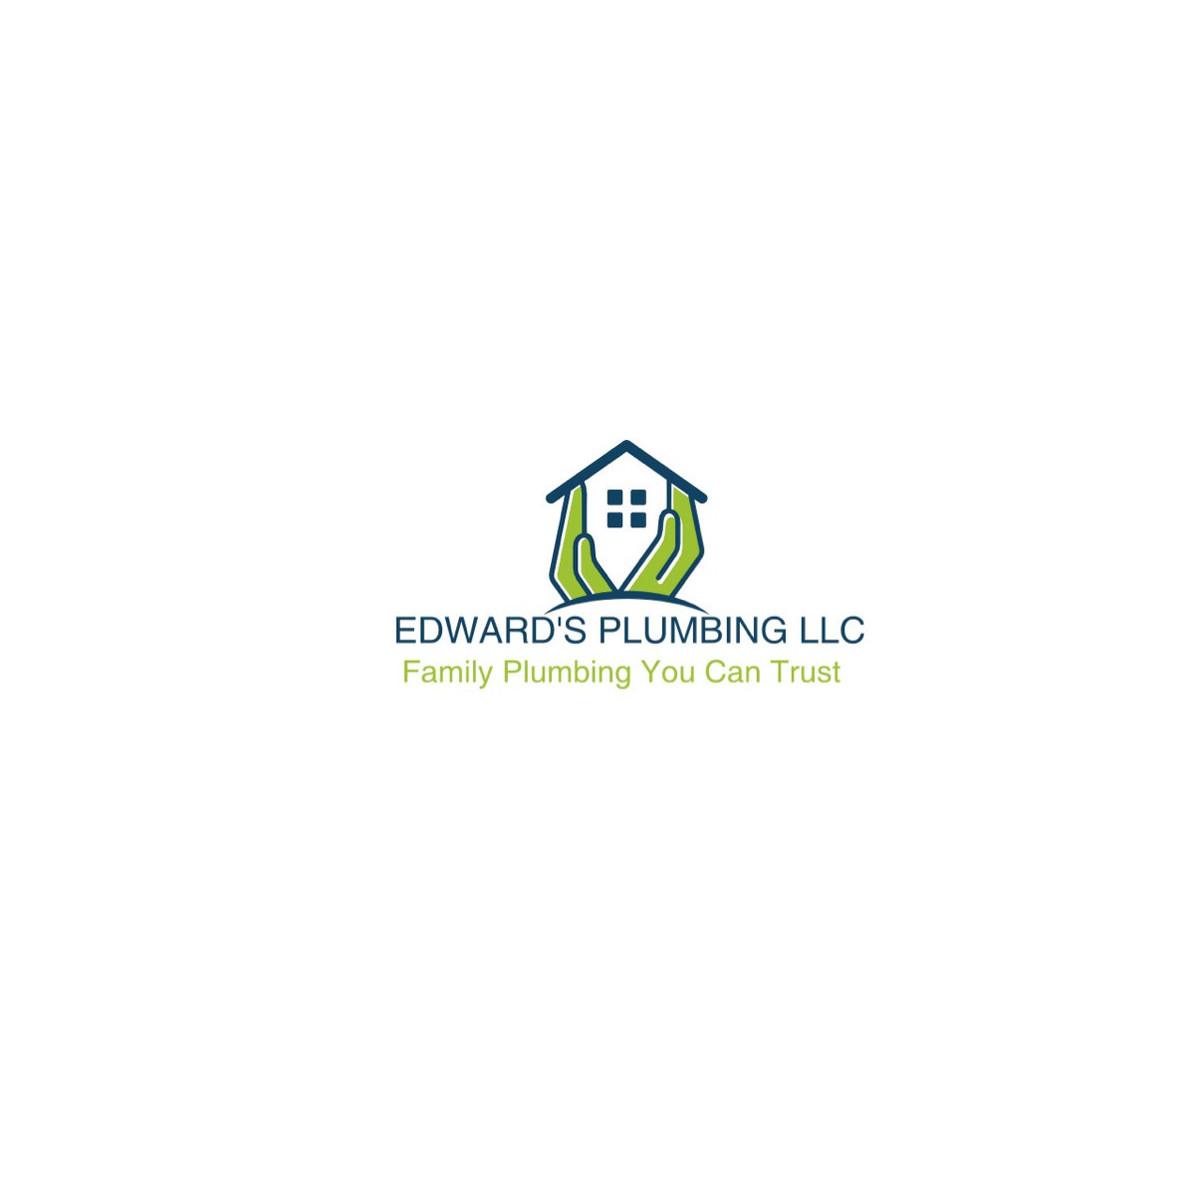 Plumber in AZ Gilbert 85298 Edwards Plumbing  LLC 1649 East Lafayette Avenue  (480)535-7515